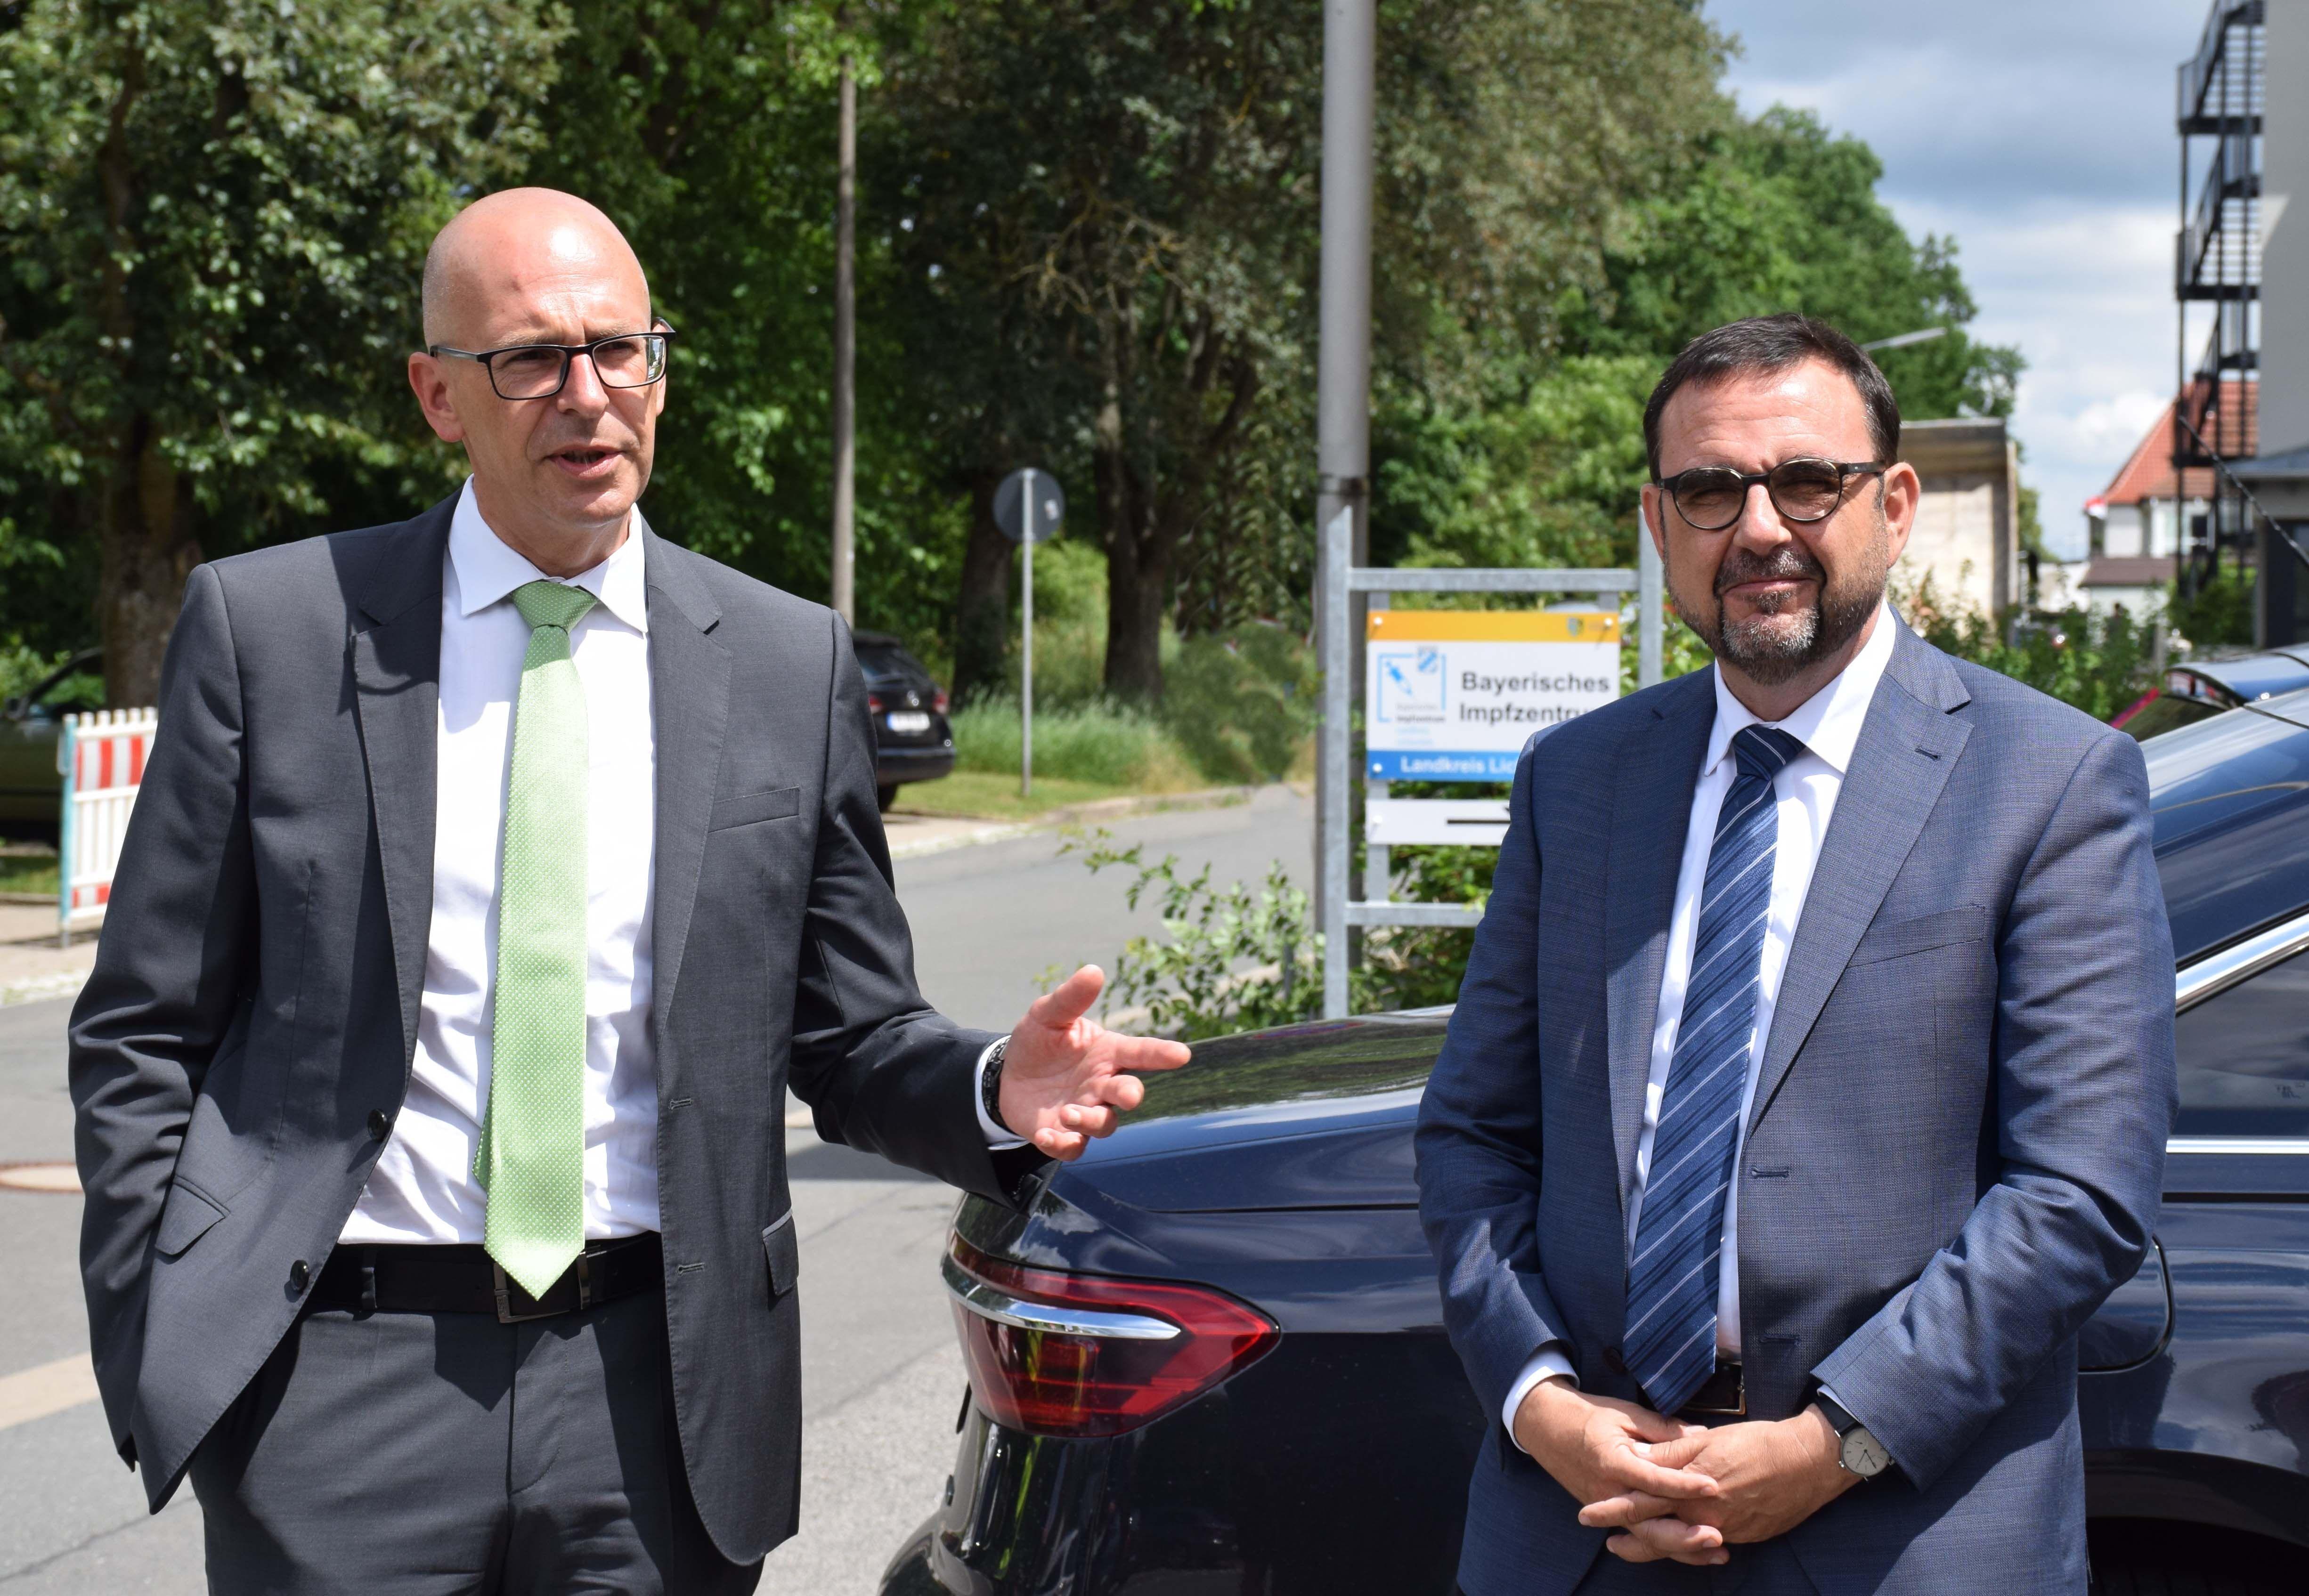 Landrat Christian Meißner, Staatsminister Klaus Holetschek. Foto: Landratsamt Lichtenfels/Heidi Bauer